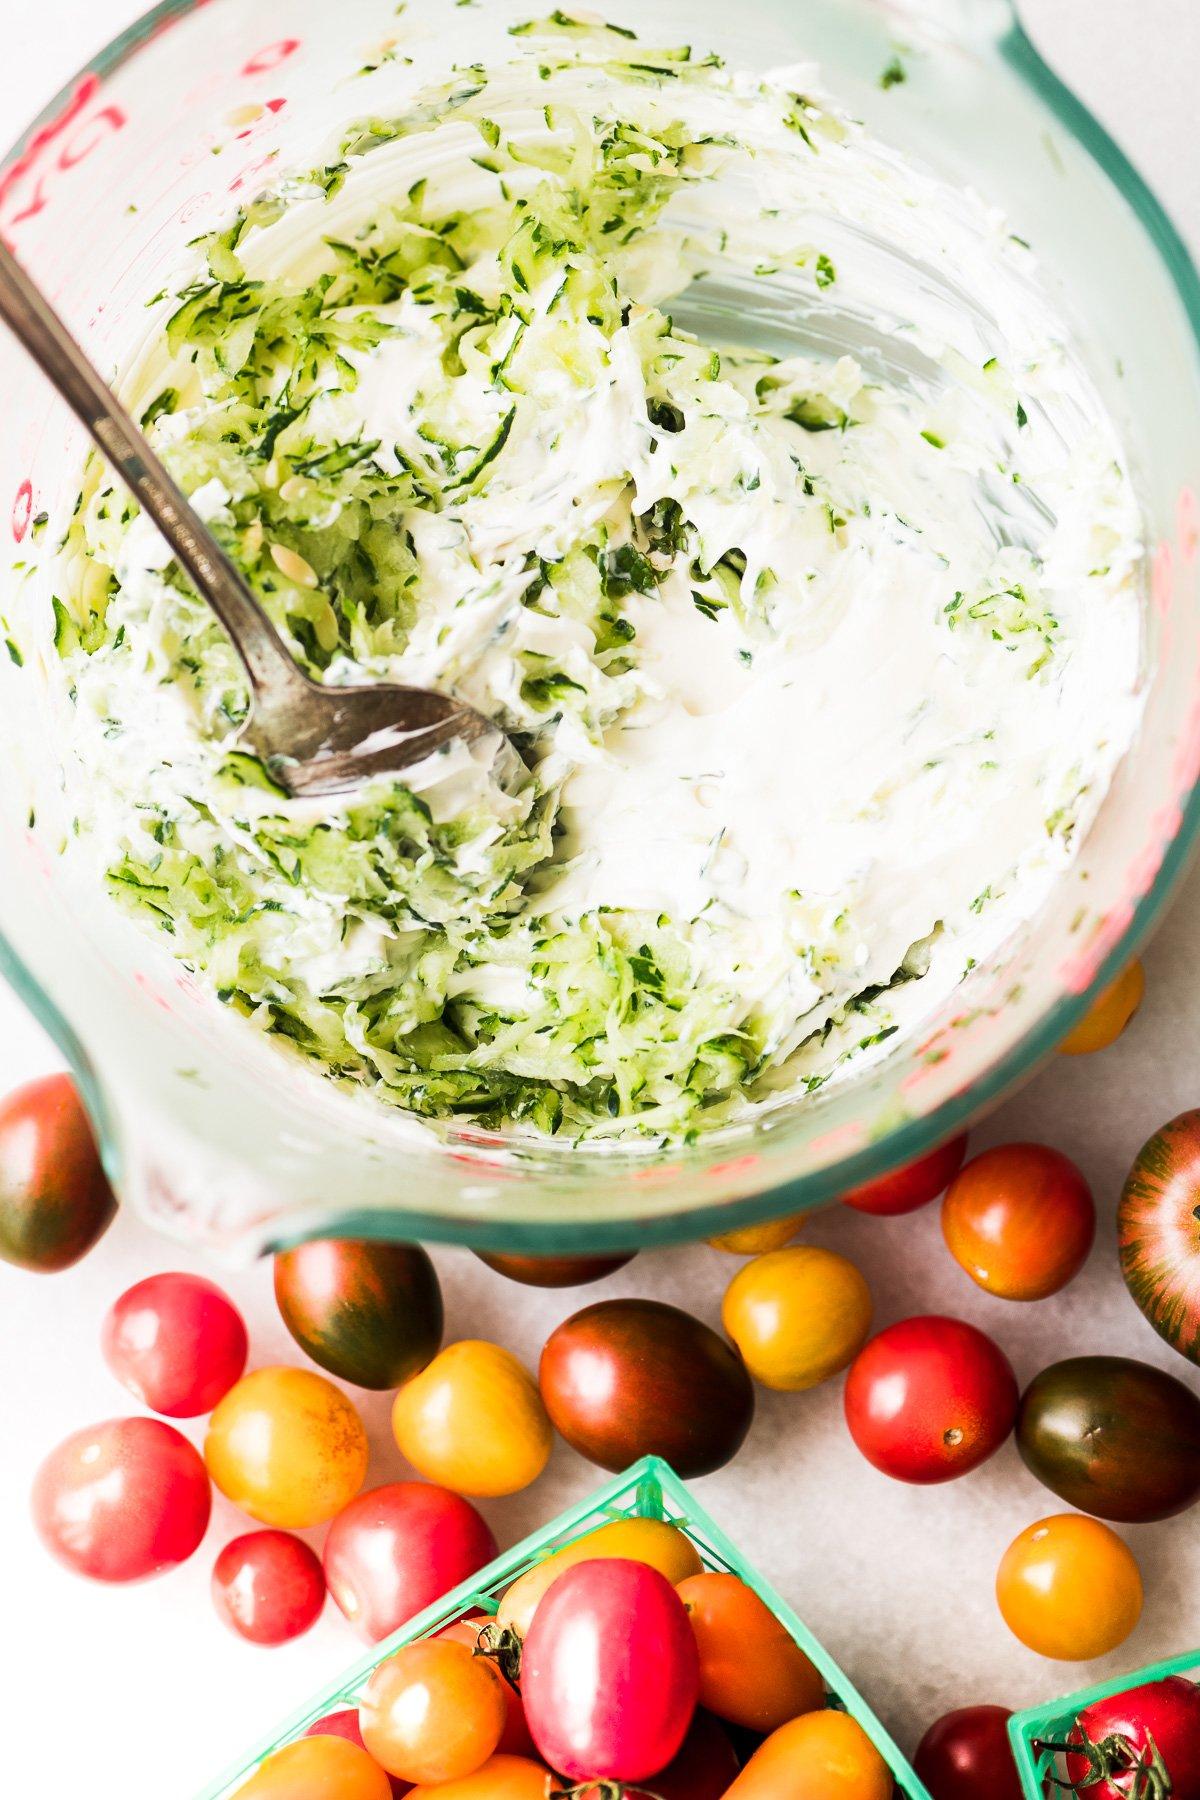 Making tzatziki dip with yogurt and shredded cucumber